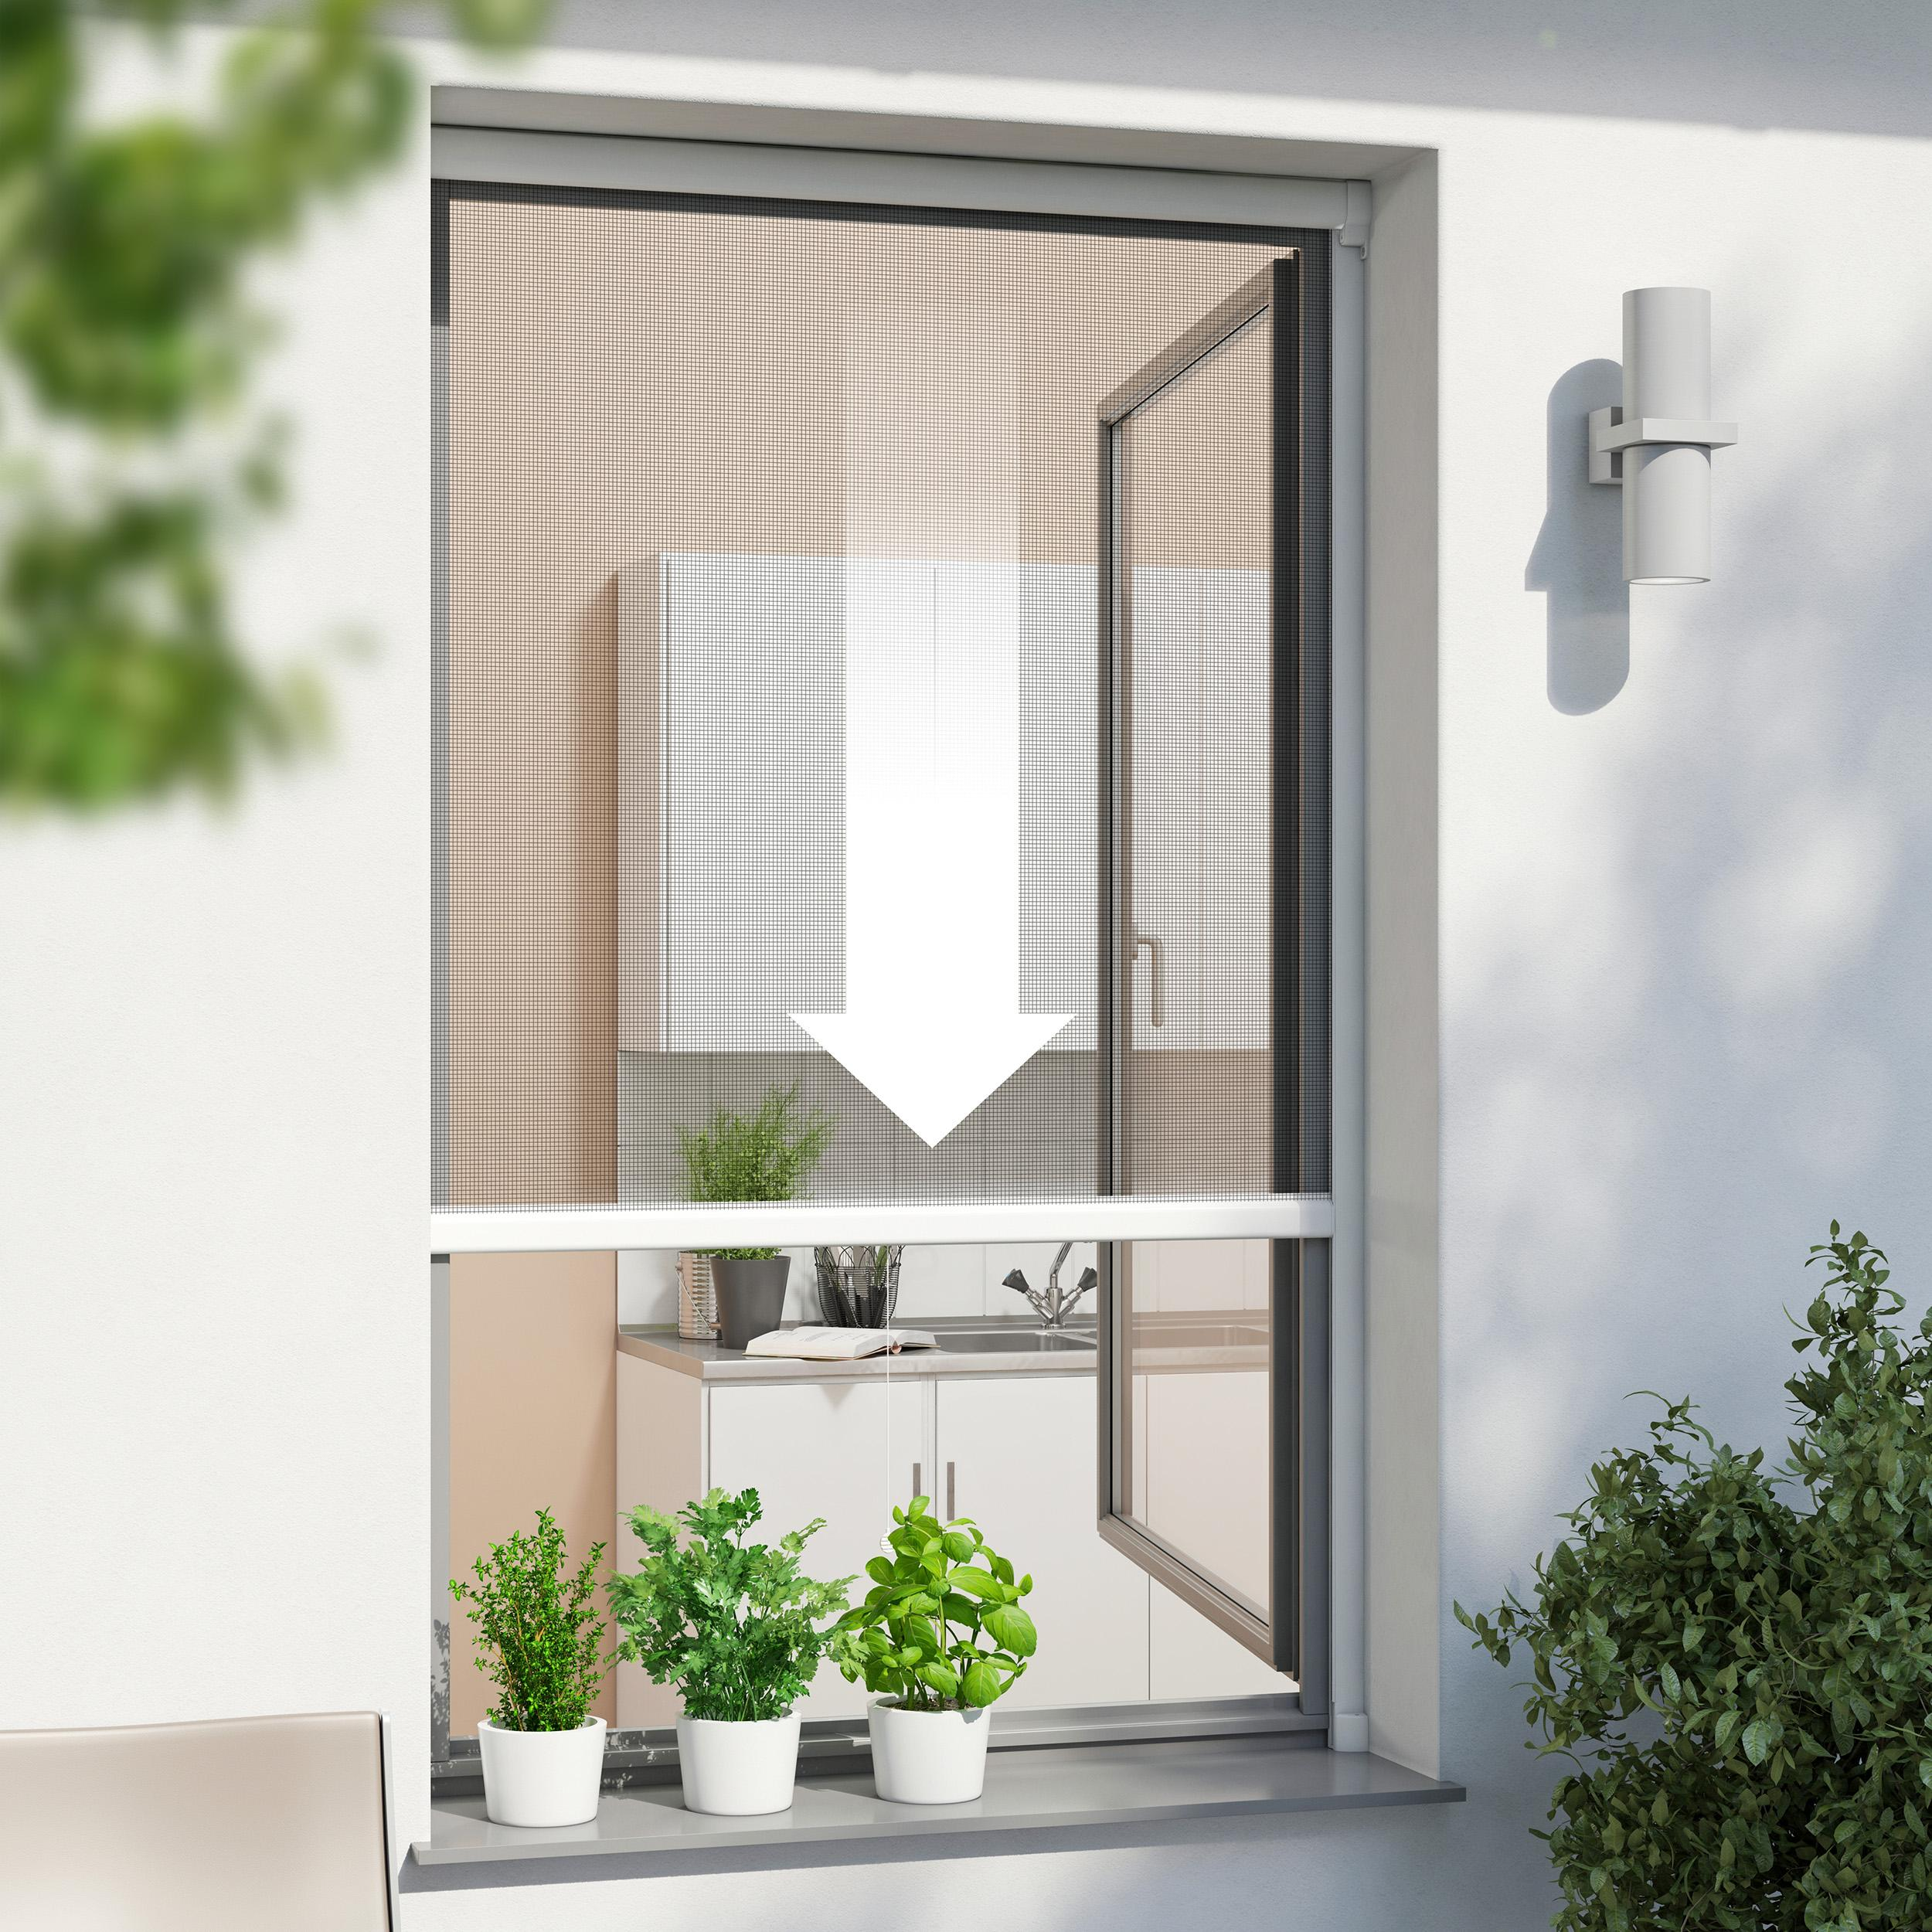 windhager insektenschutz rollo fliegengitter alurahmen f r fenster individuell k rzbar 160 x. Black Bedroom Furniture Sets. Home Design Ideas